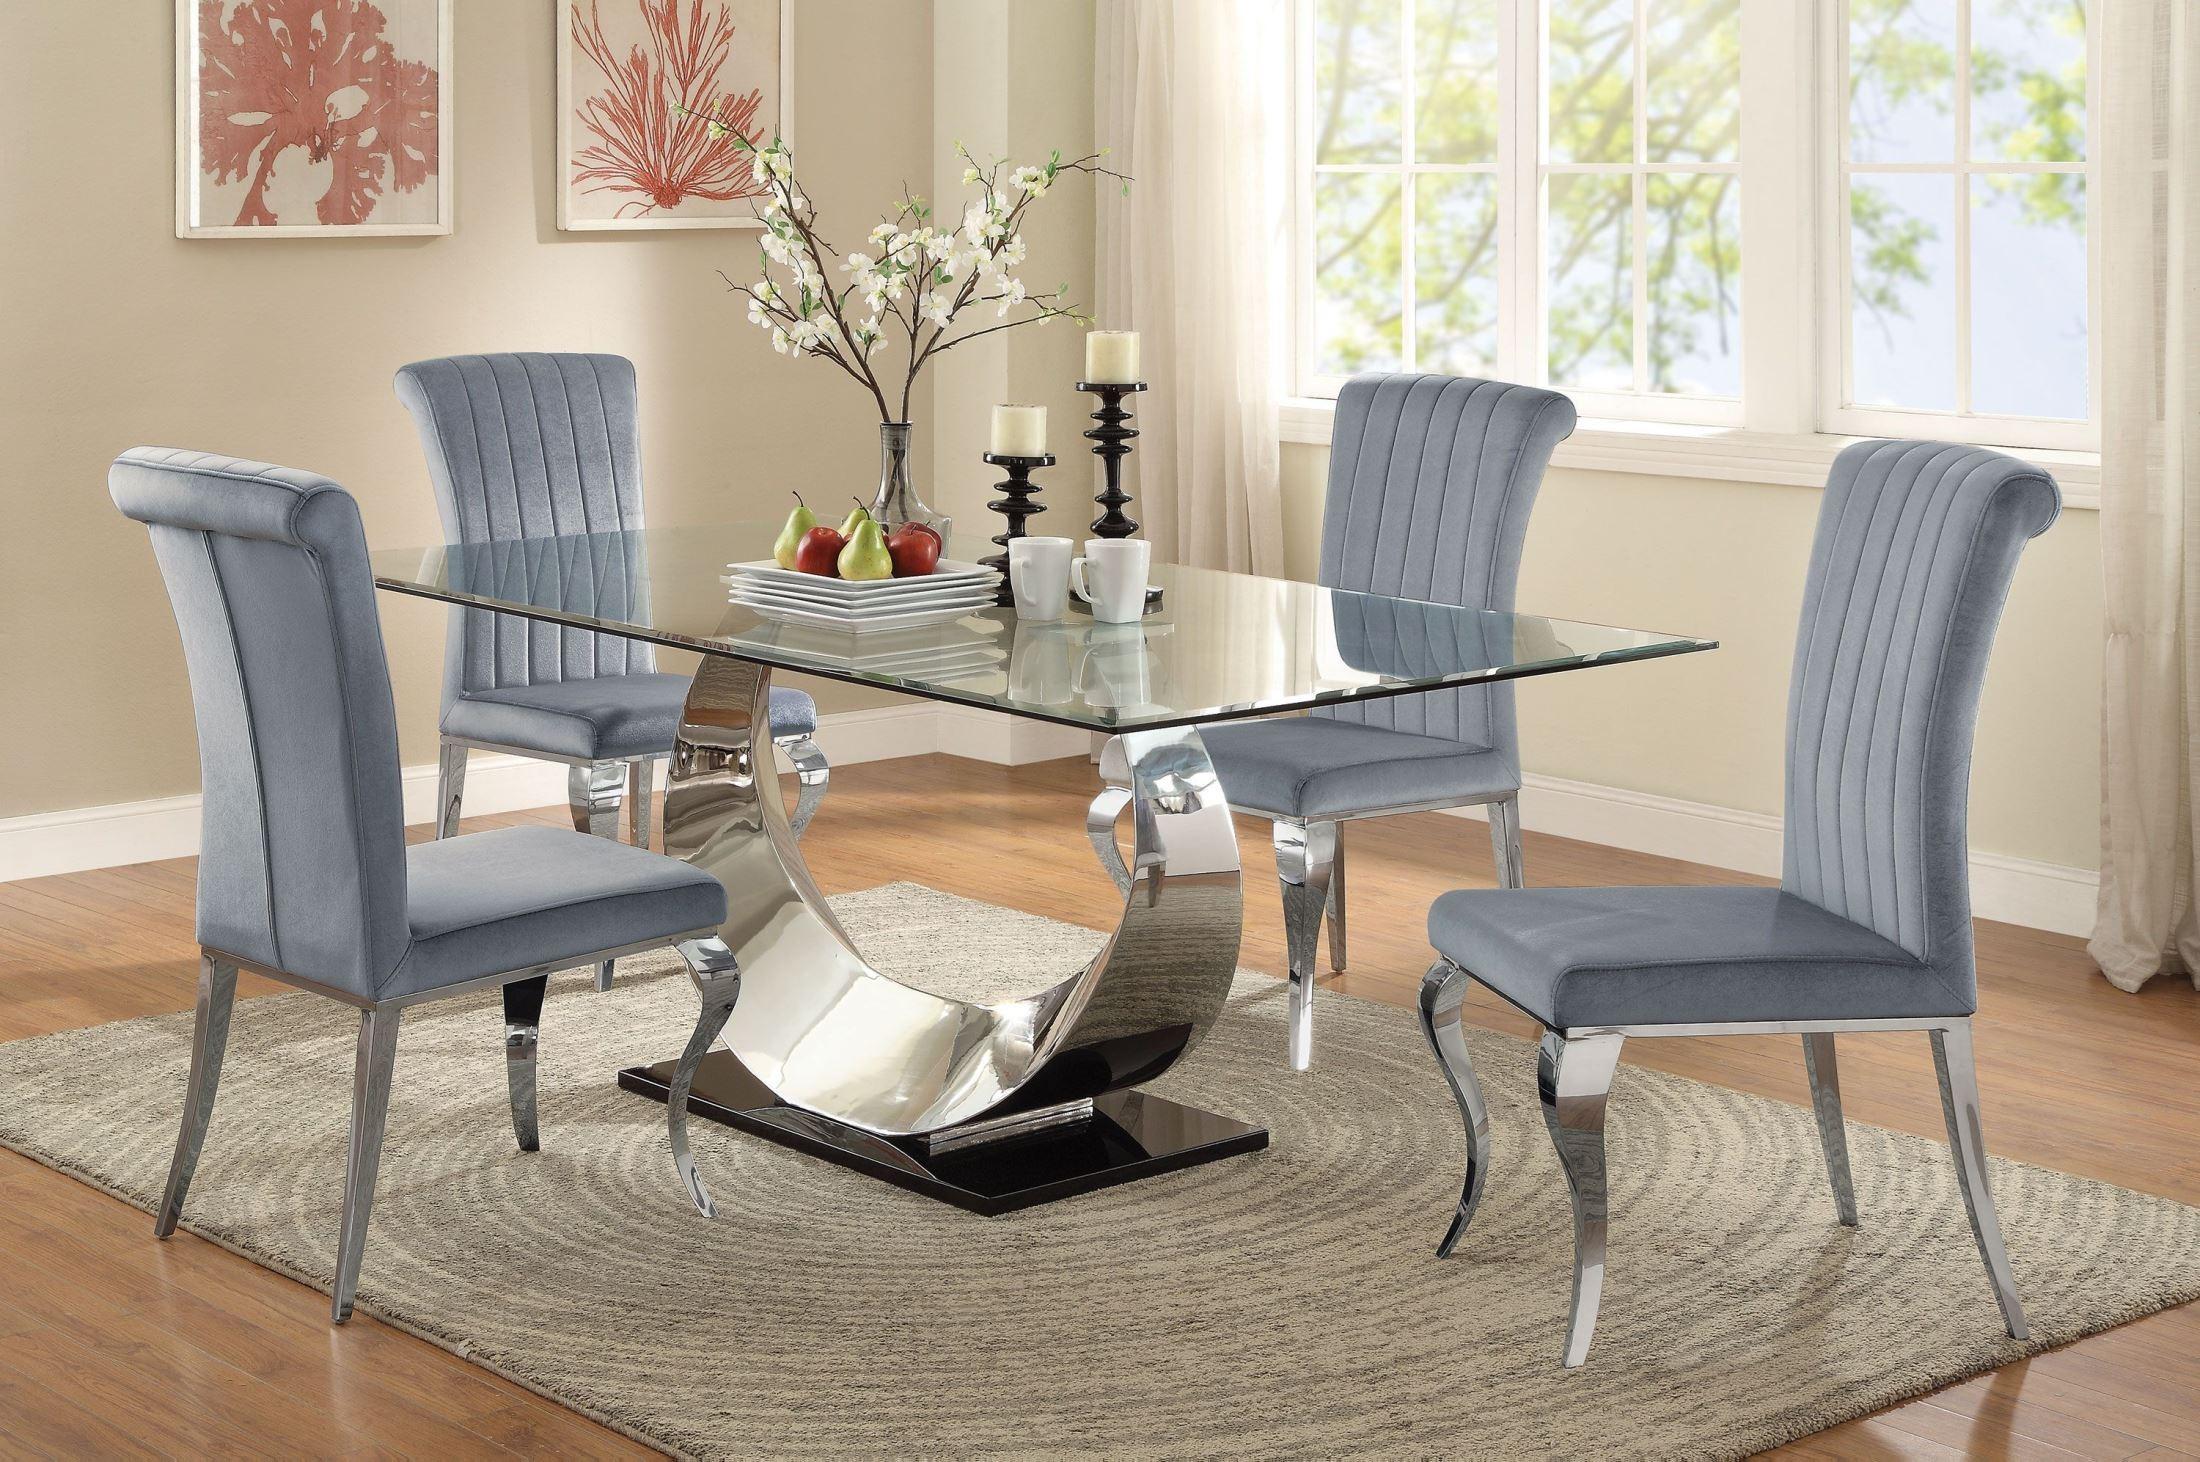 Manessier Chrome Dining Room Set, 107051, Coaster Furniture